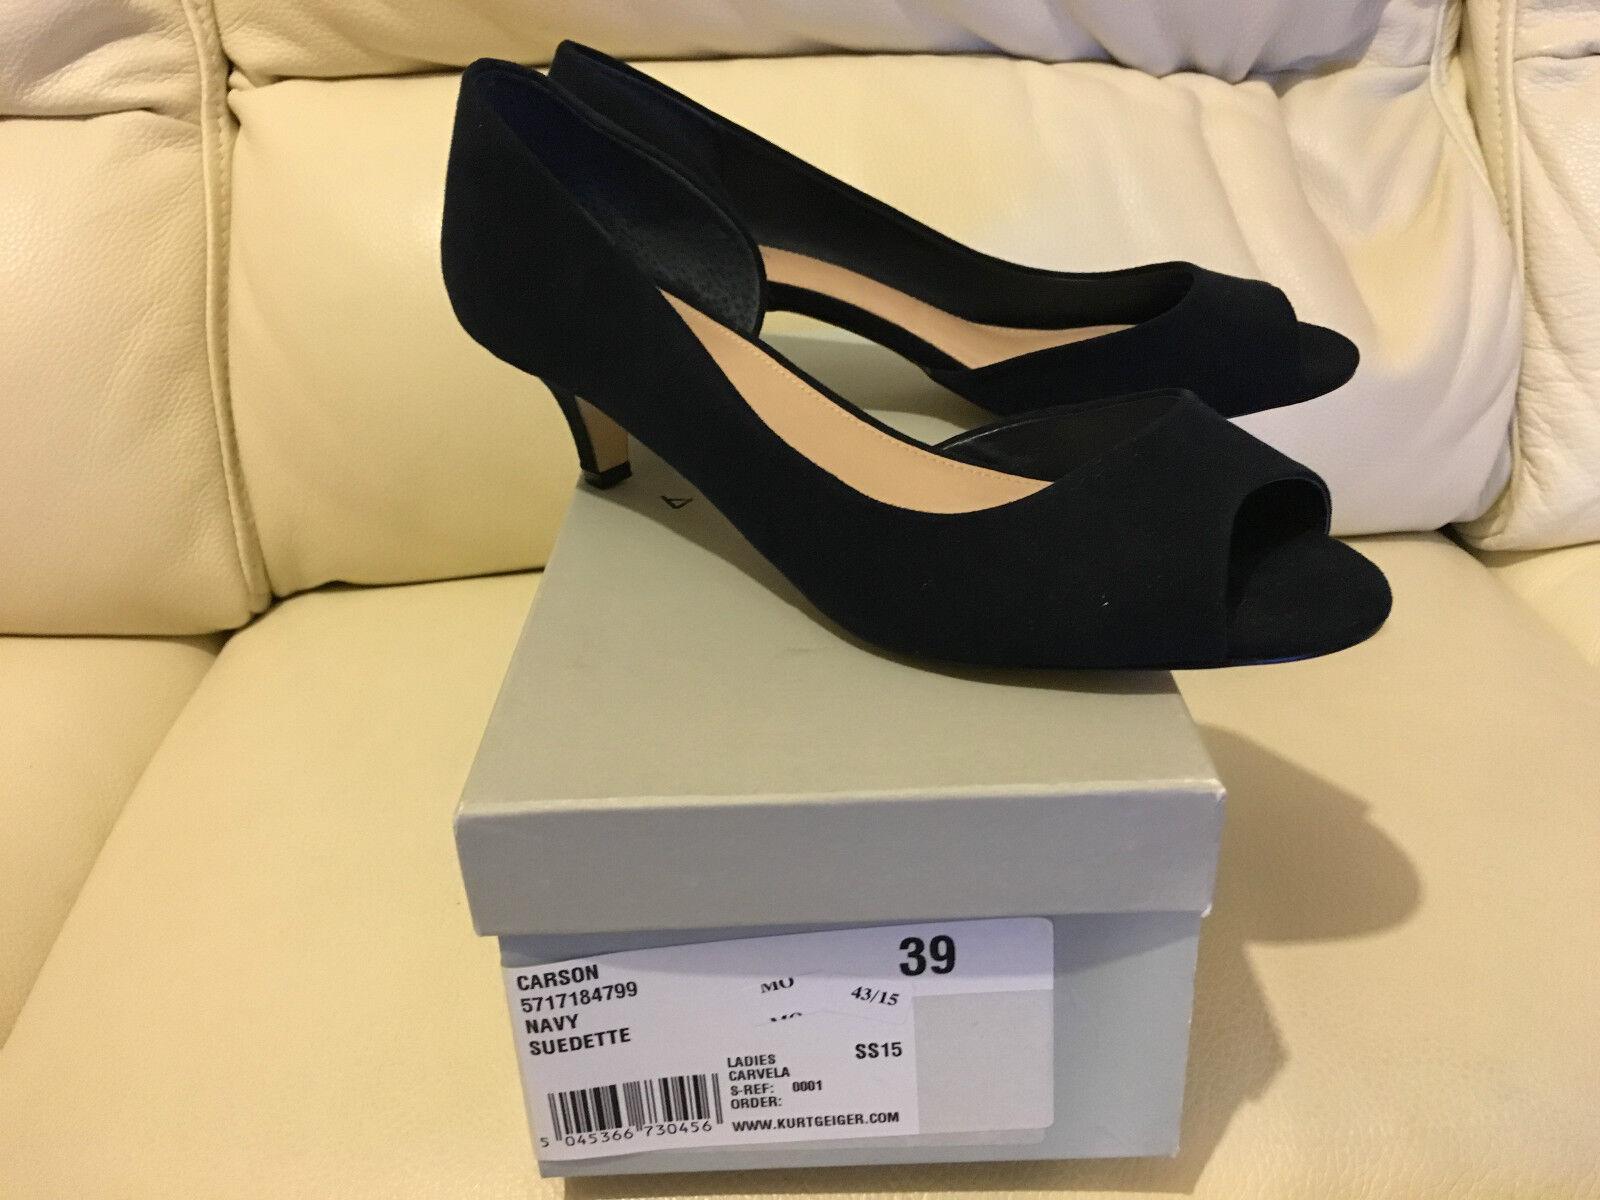 Kurt Geiger Ladies Carvela Carson Navy Suedette Heels shoes All Sizes NEW